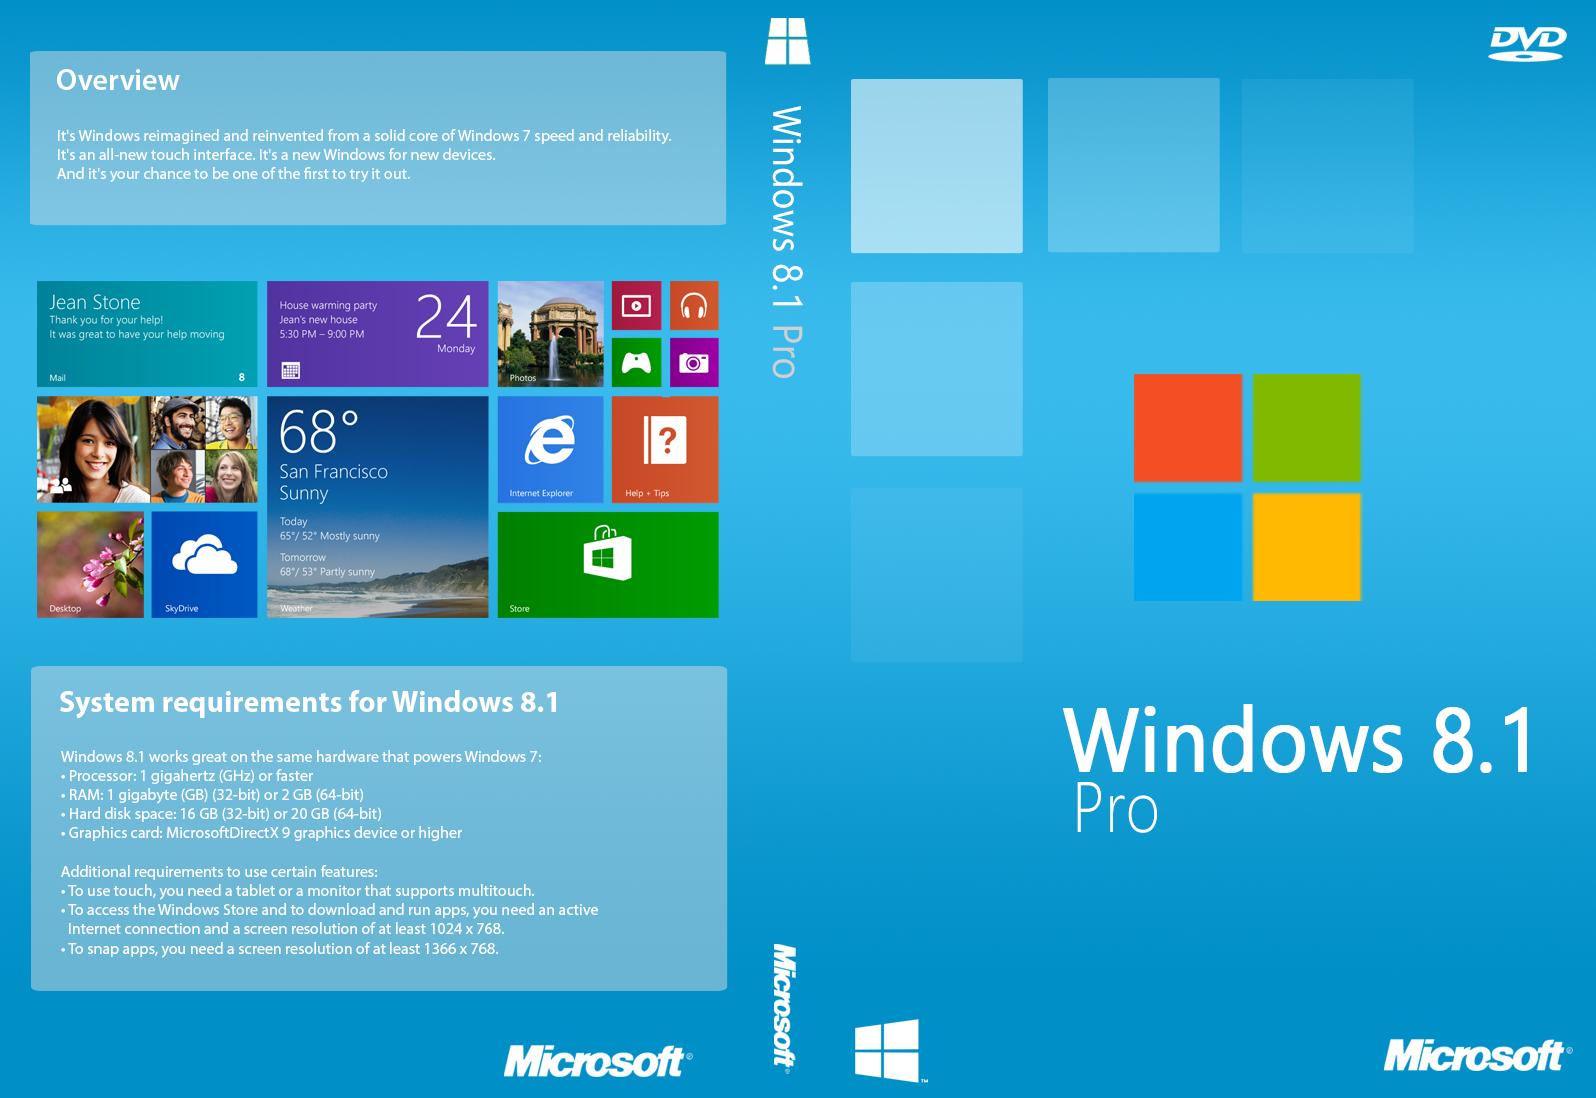 Download Windows 8.1 Pro VL Update 1 x86 e x64 PT-BR